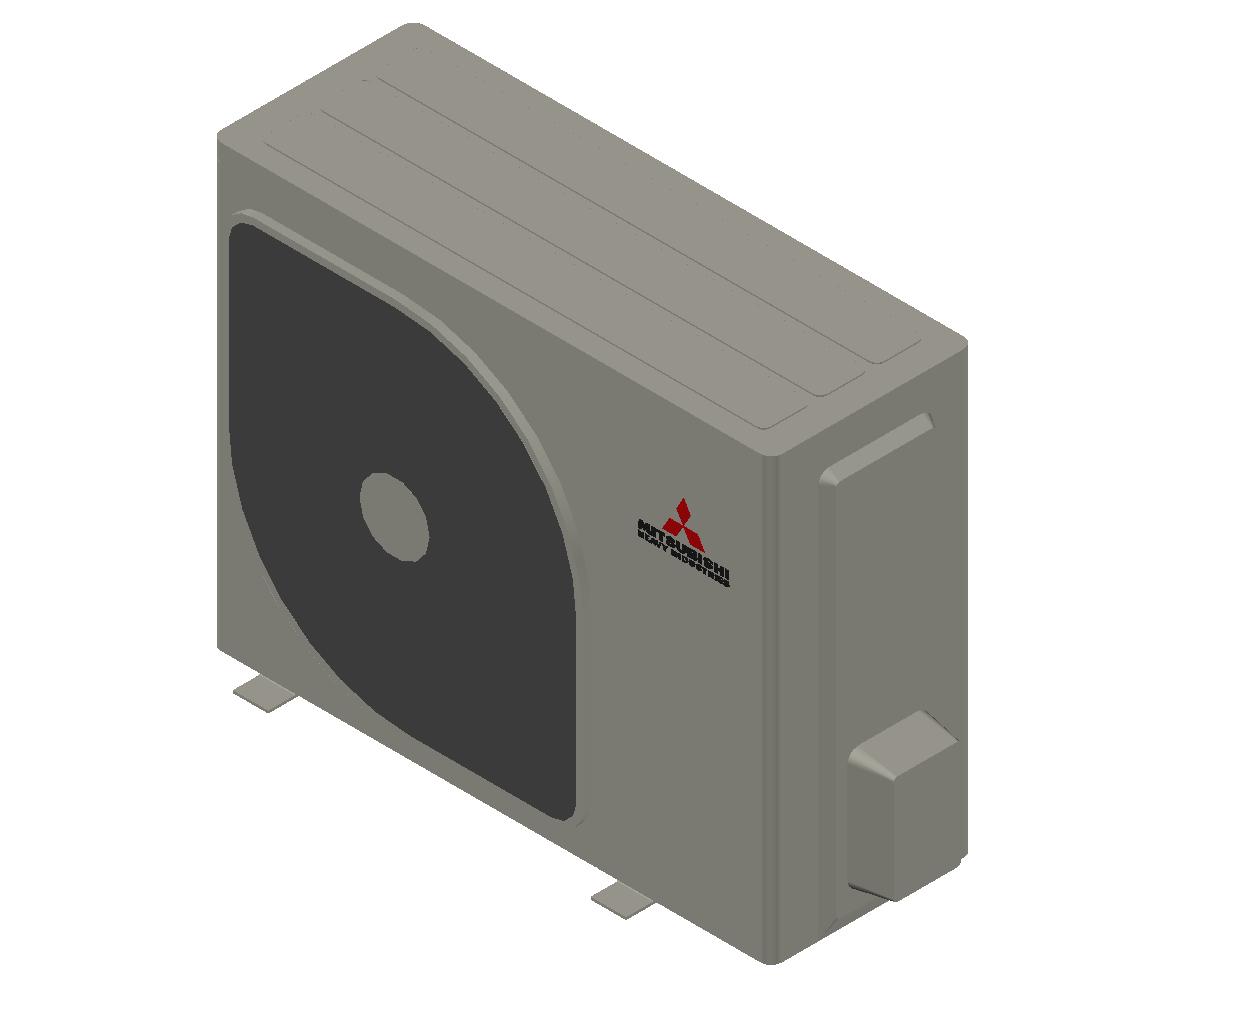 HC_Heat Pump_MEPcontent_Mitsubishi Heavy Industries_PAC-RAC_SRC20ZSX-W_INT-EN.dwg